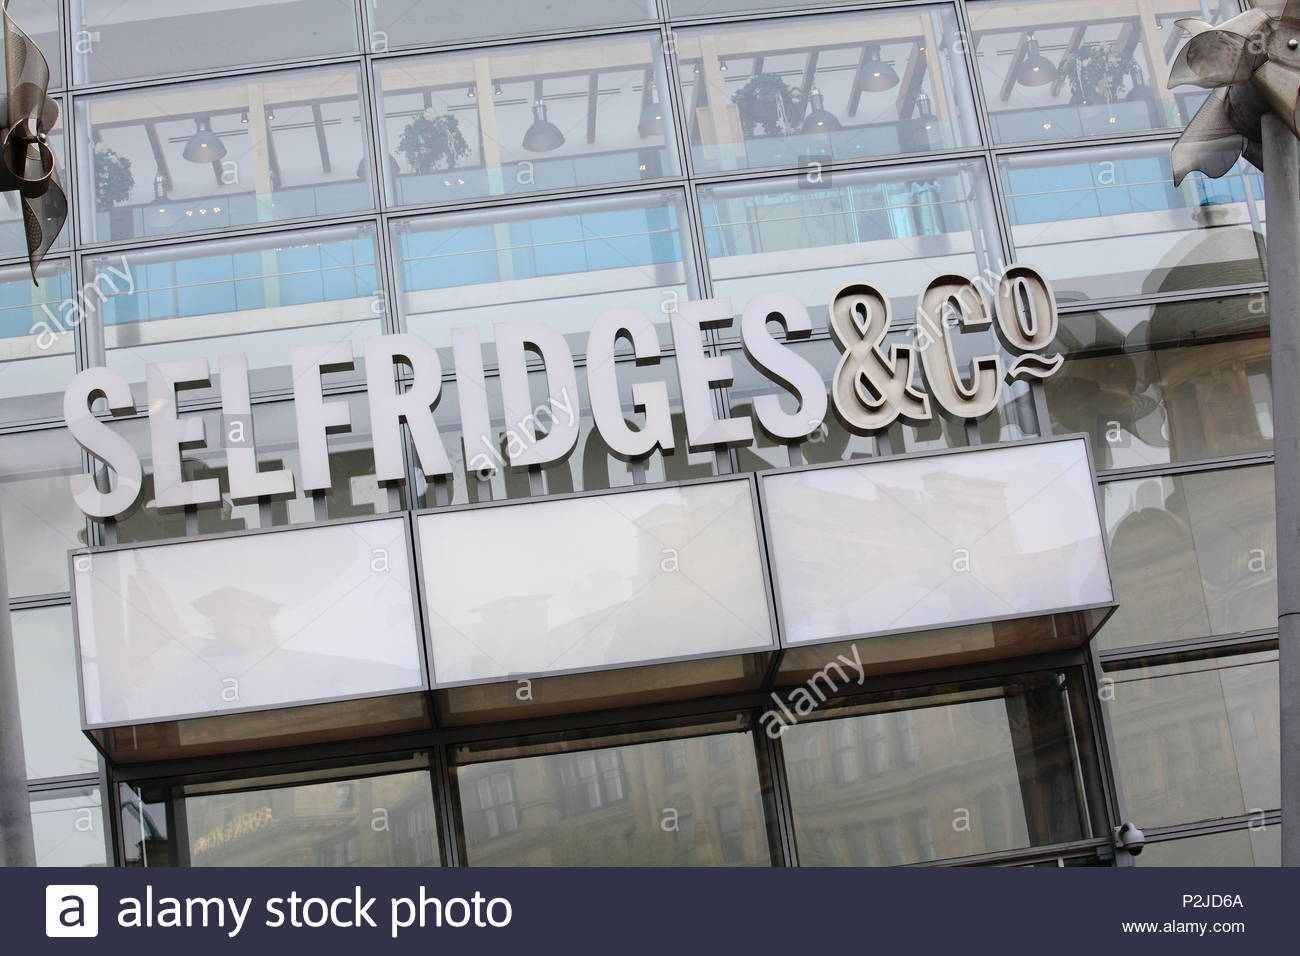 Selfridges & Co Store Front at Manchester City Centre, Manchester UK Summer June 2018 - Stock Image